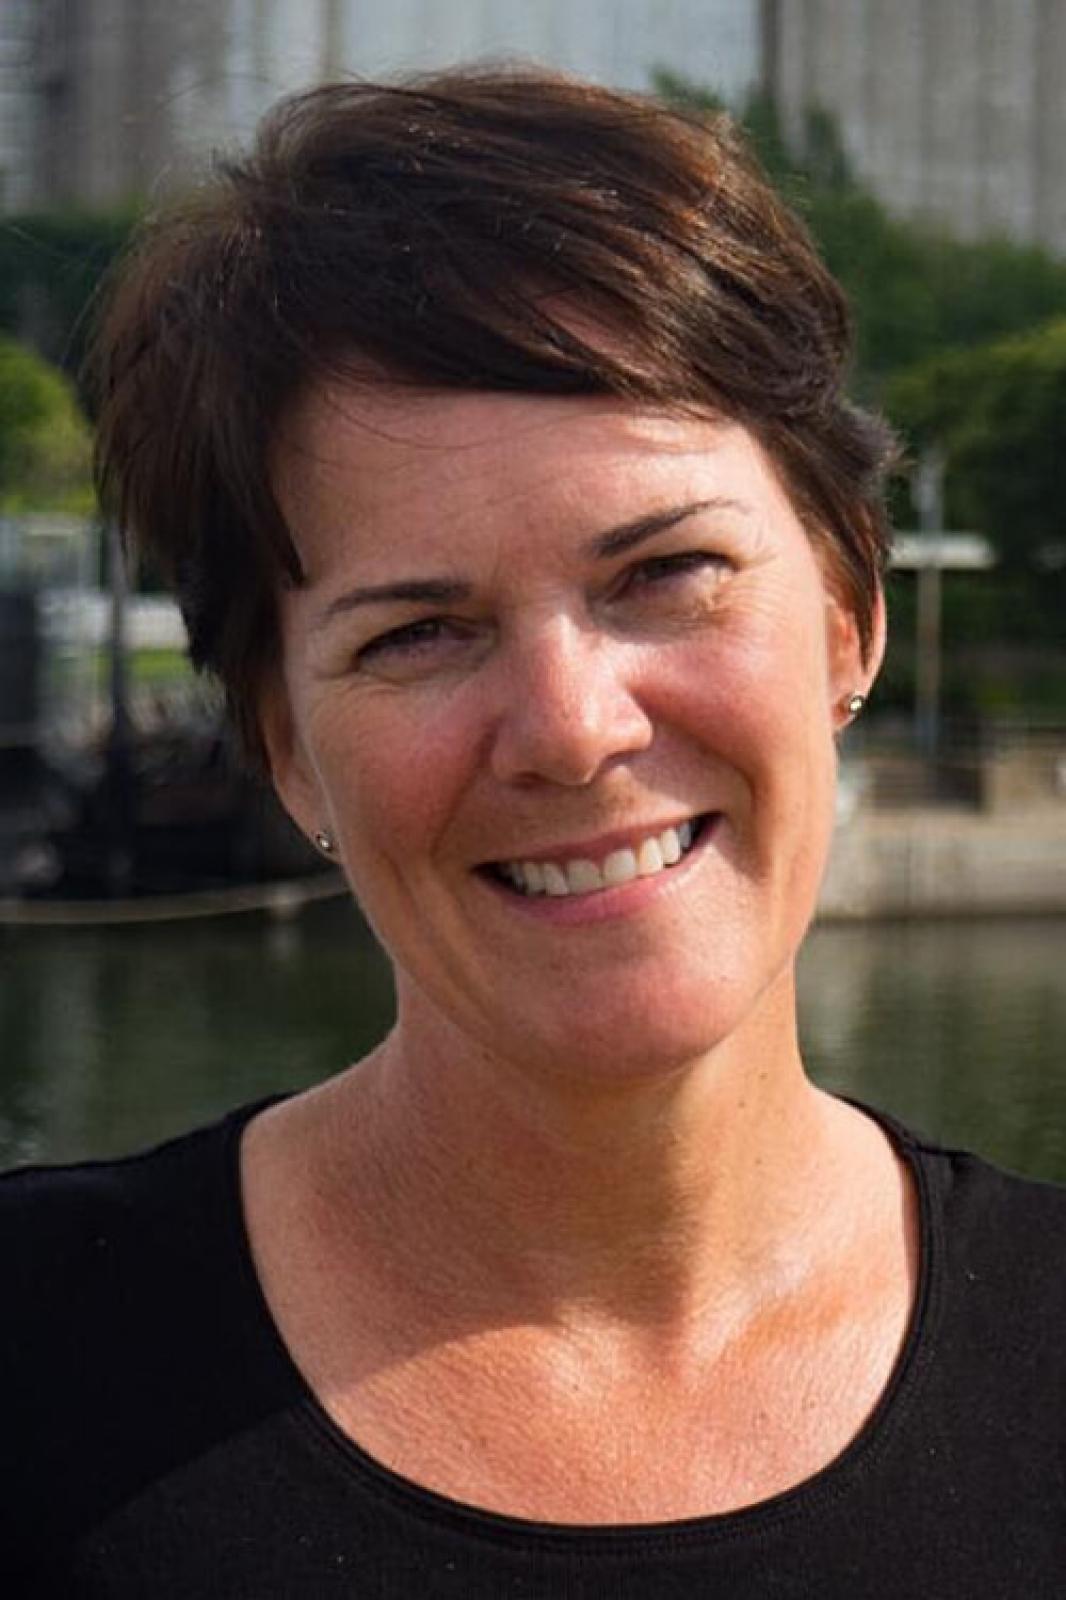 Danielle St-Aubin